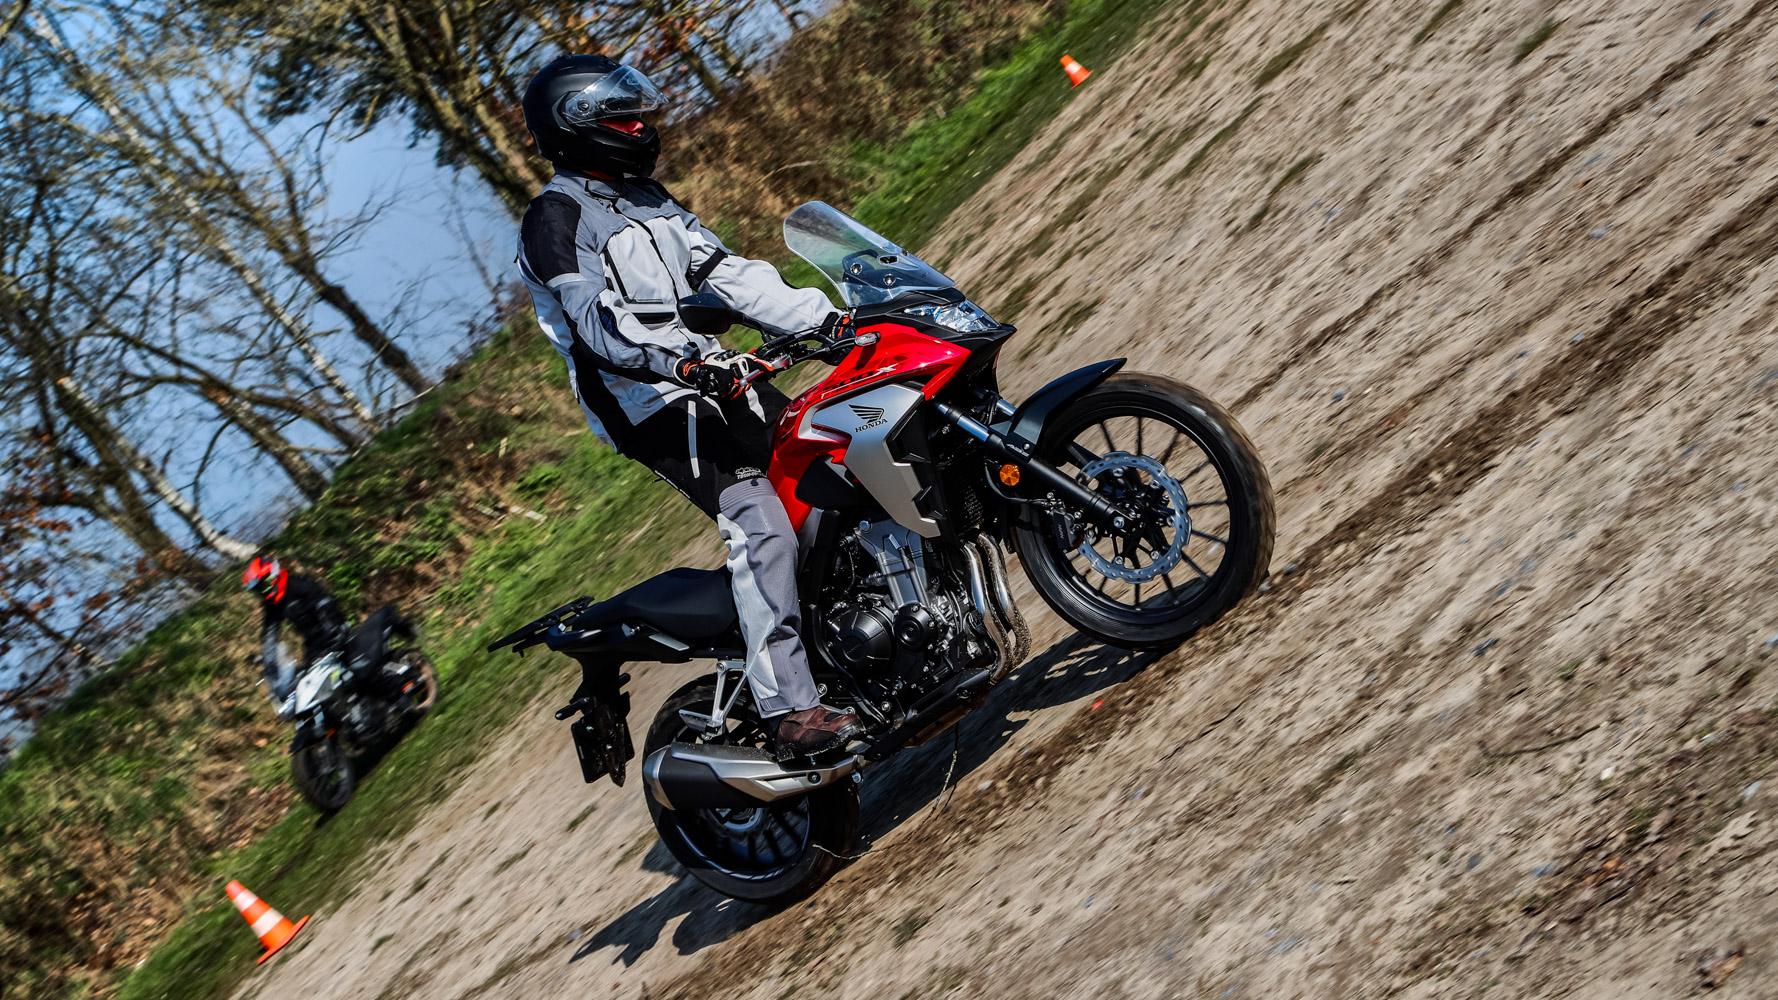 Hondapark Olmen - Balen - CB500x - CB500 x